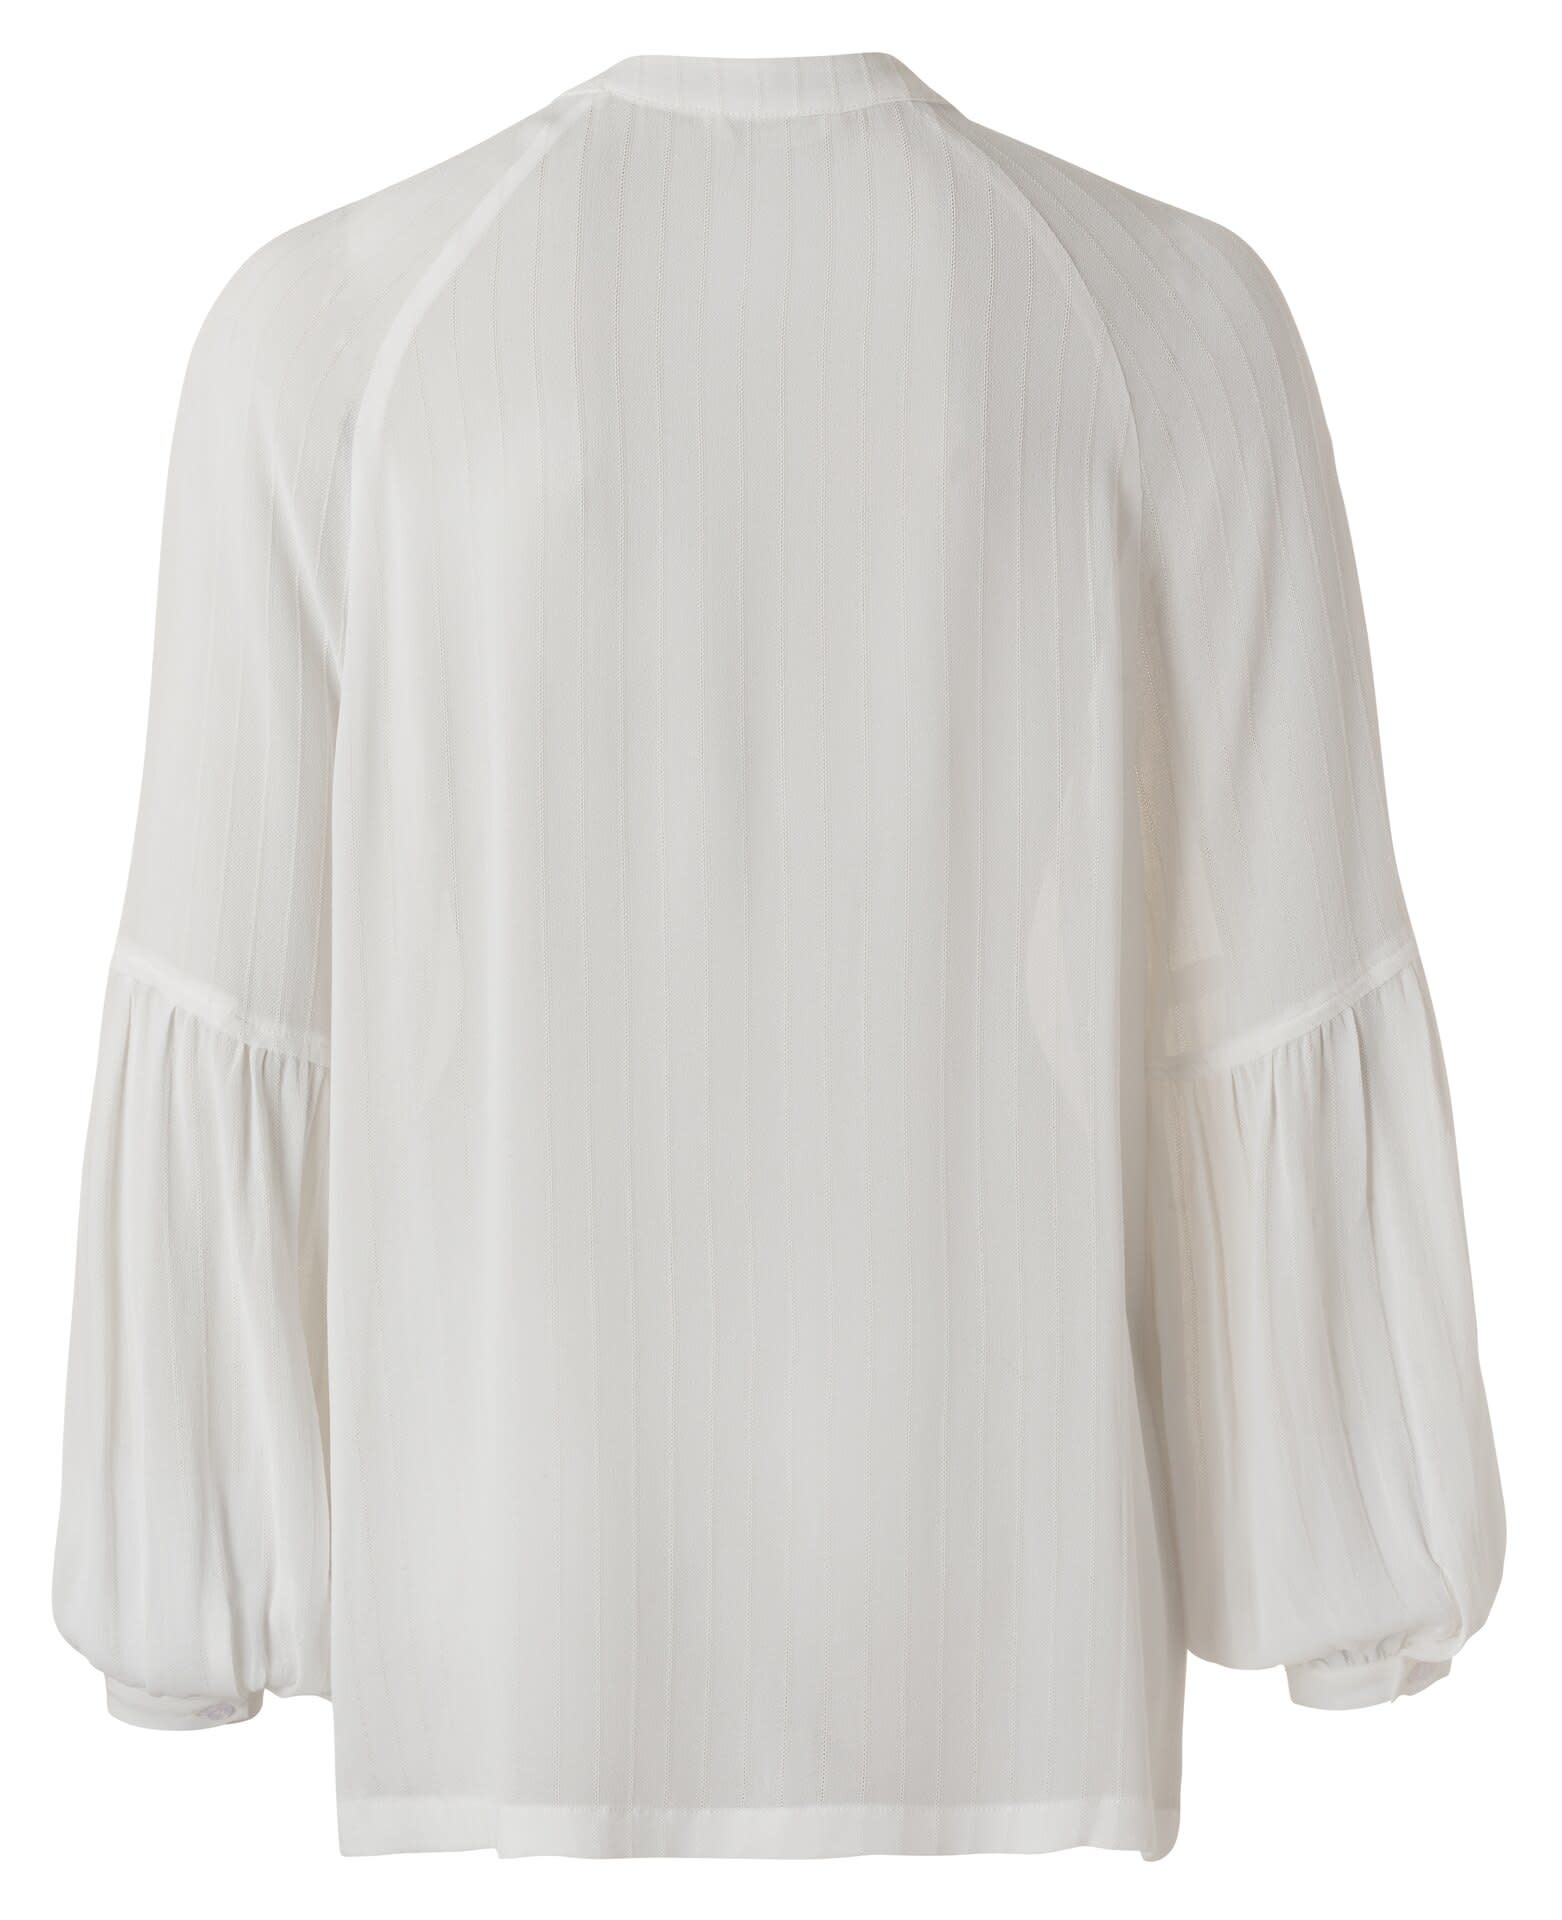 YAYA Women Puff sleeve blouse